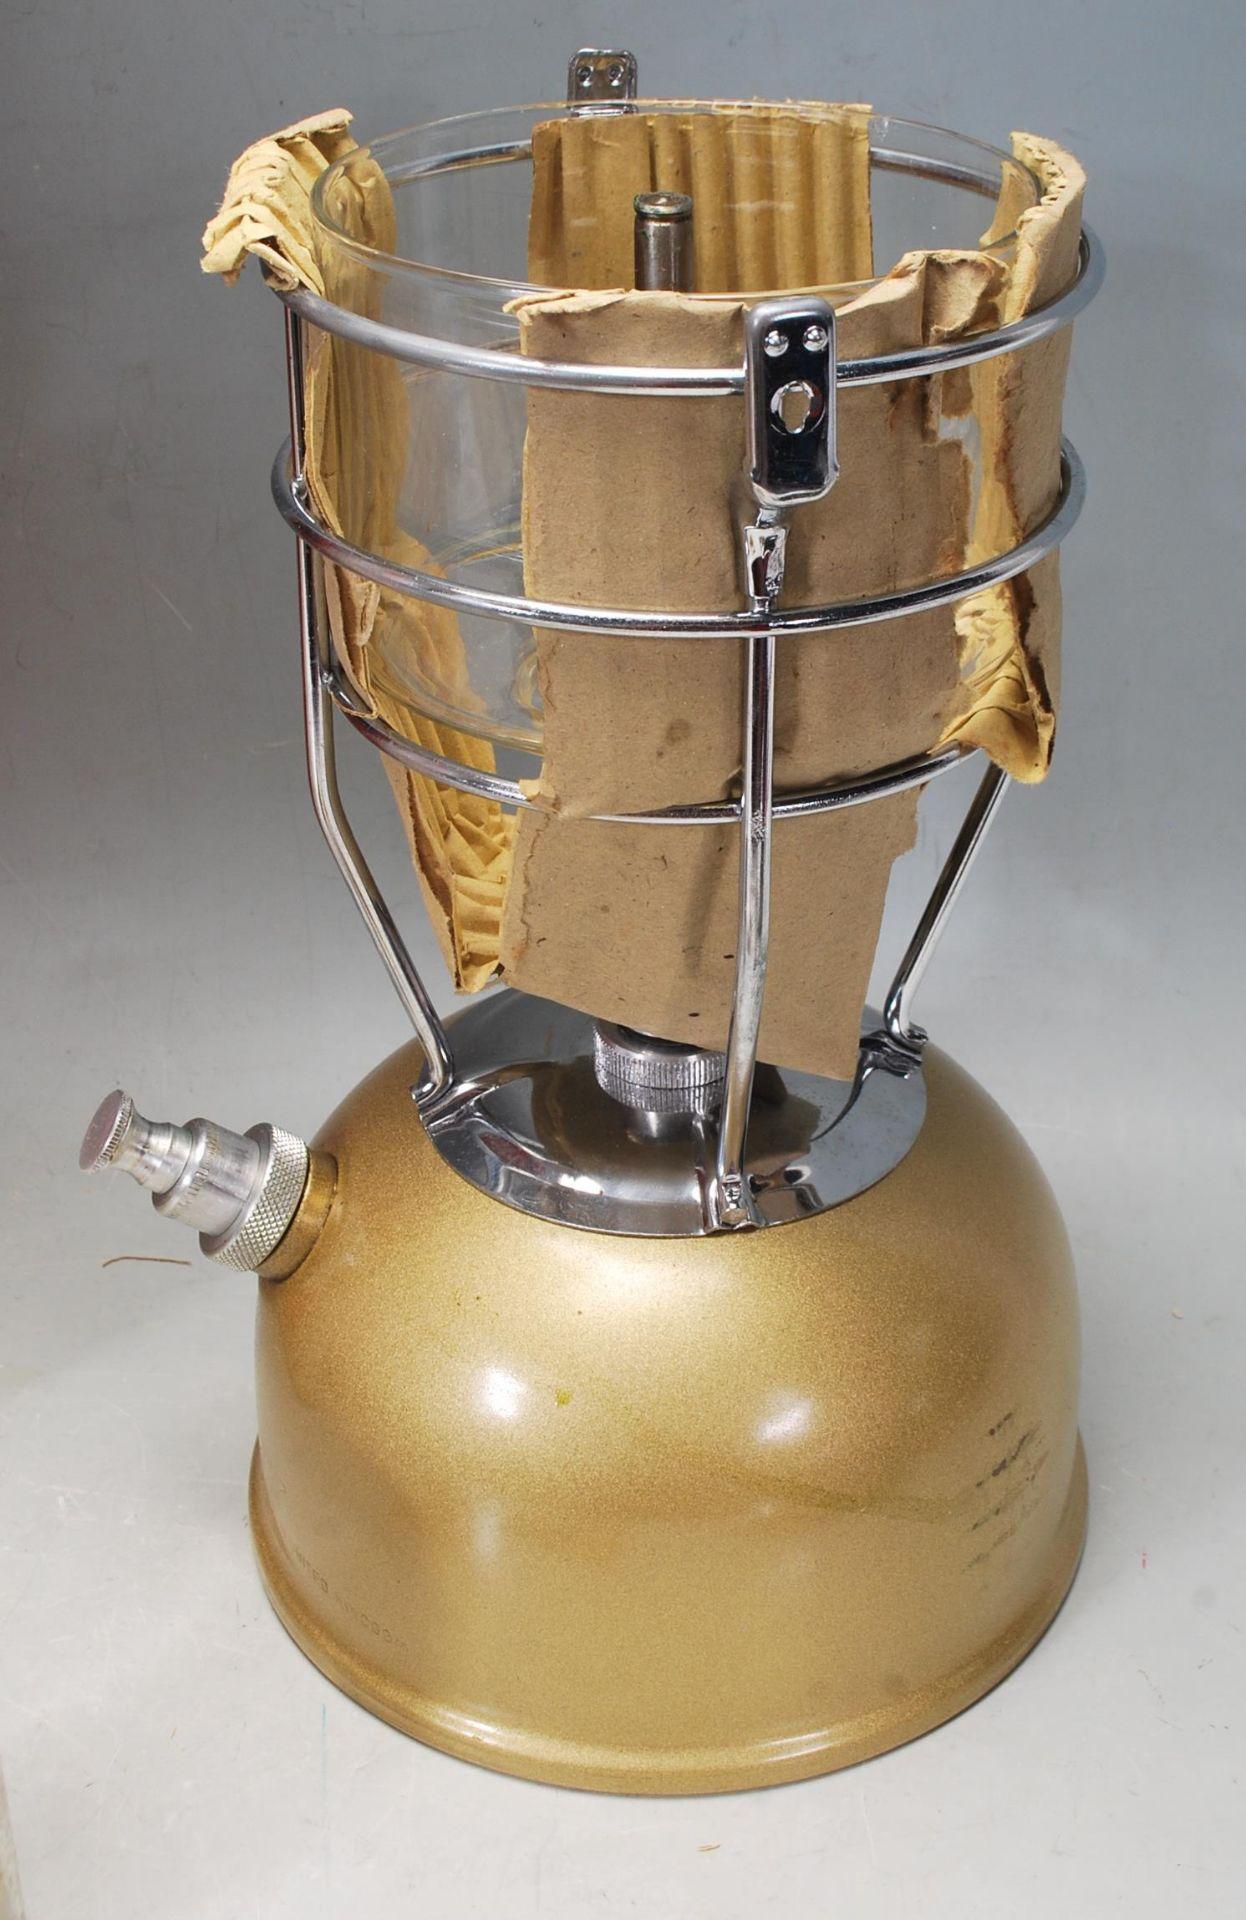 VINTAGE TILLEY STORMLIGHT MODEL X246B PARAFFIN LAMP - Image 2 of 7